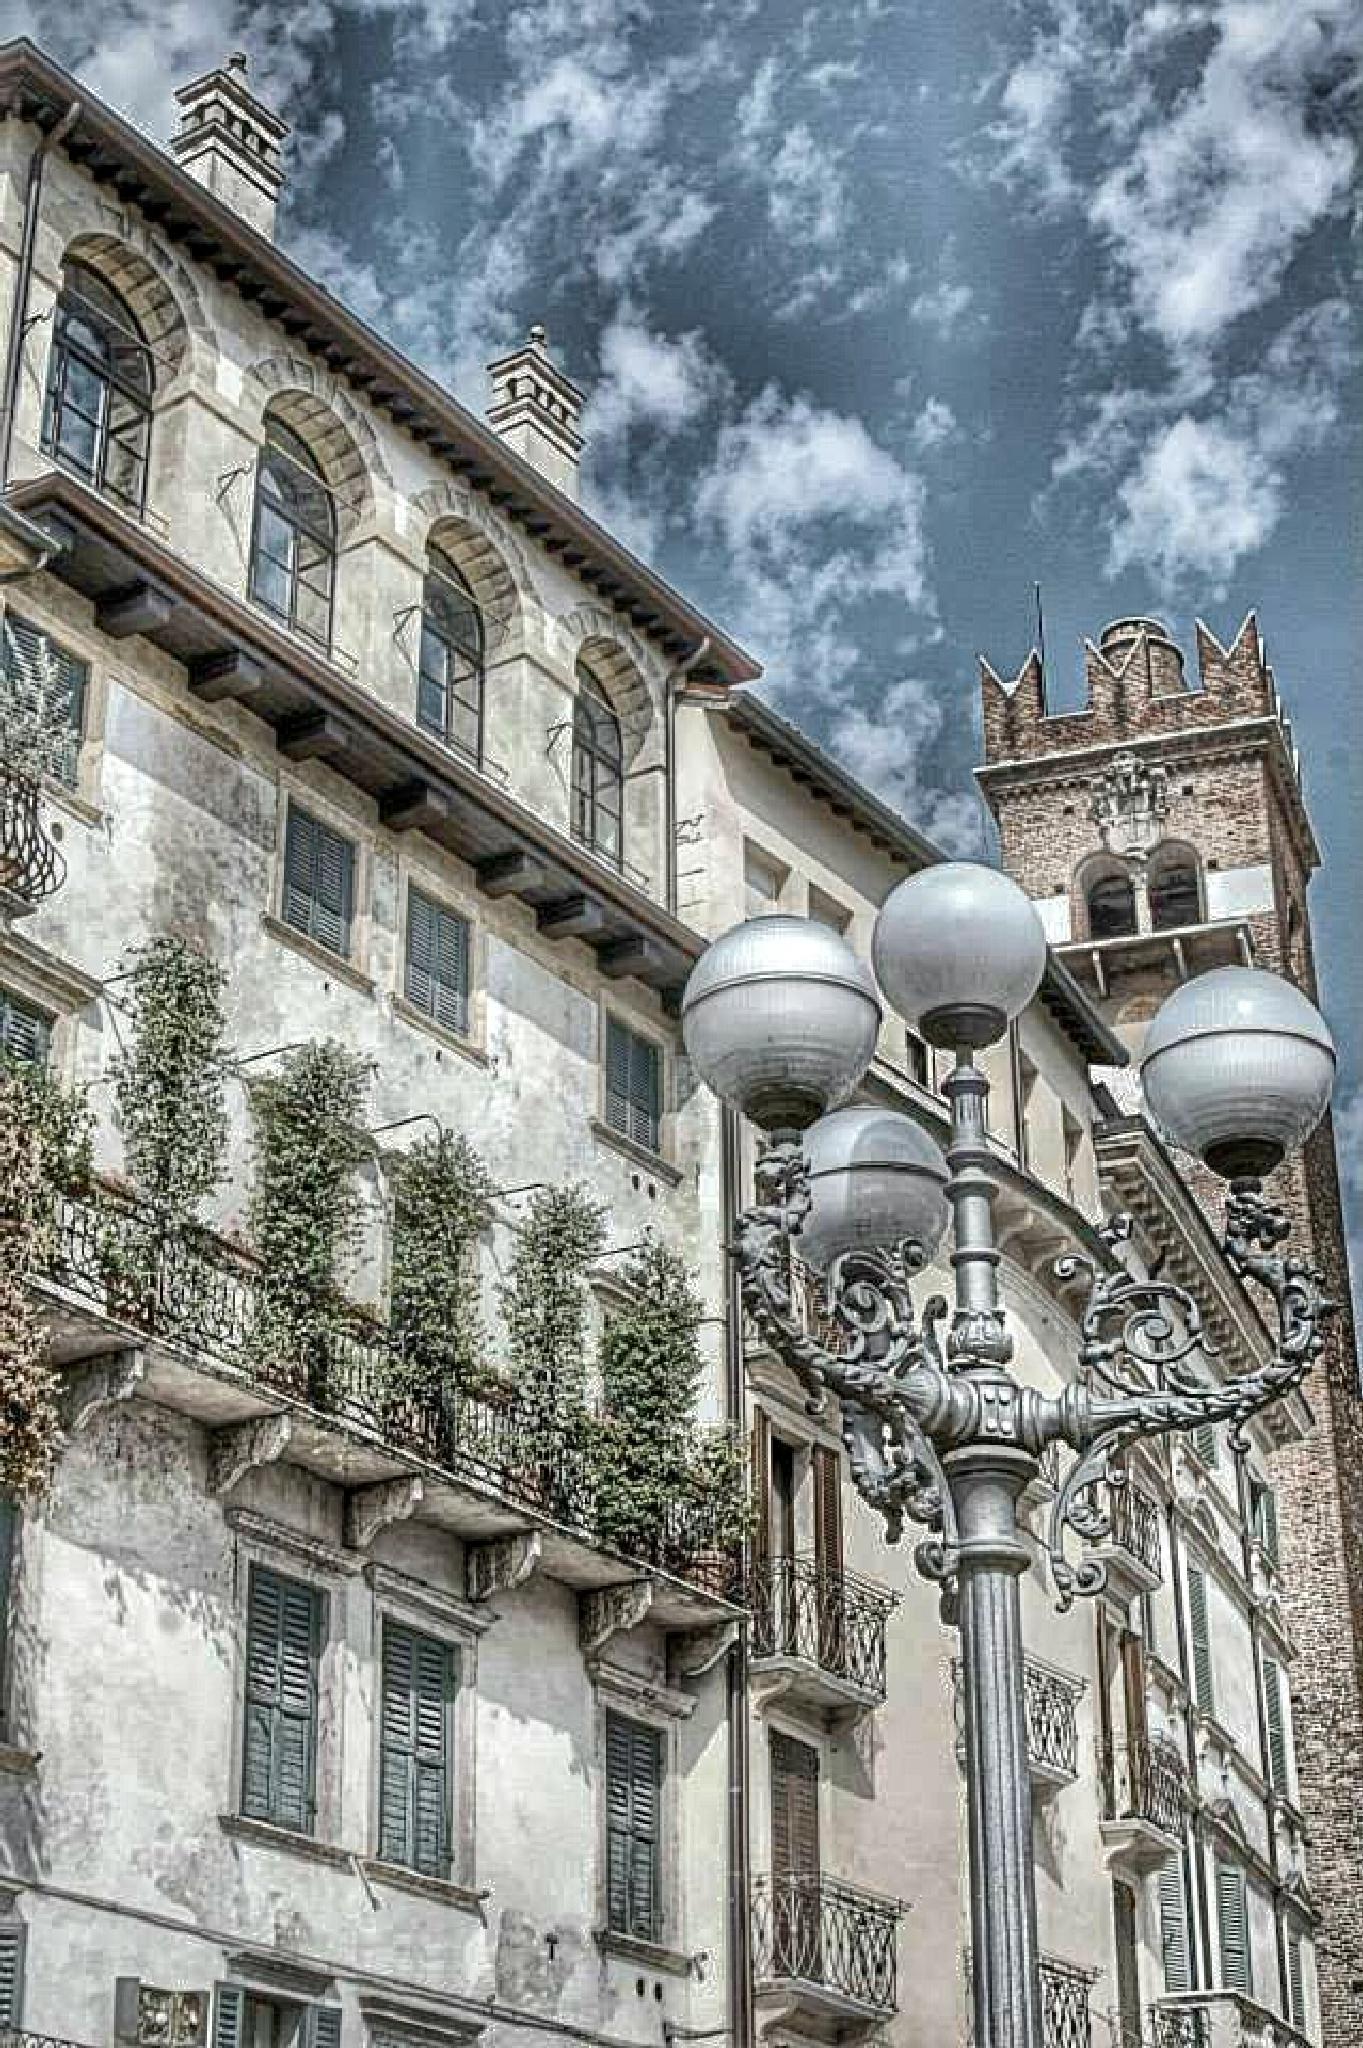 Verona 1 by ron.krijnen